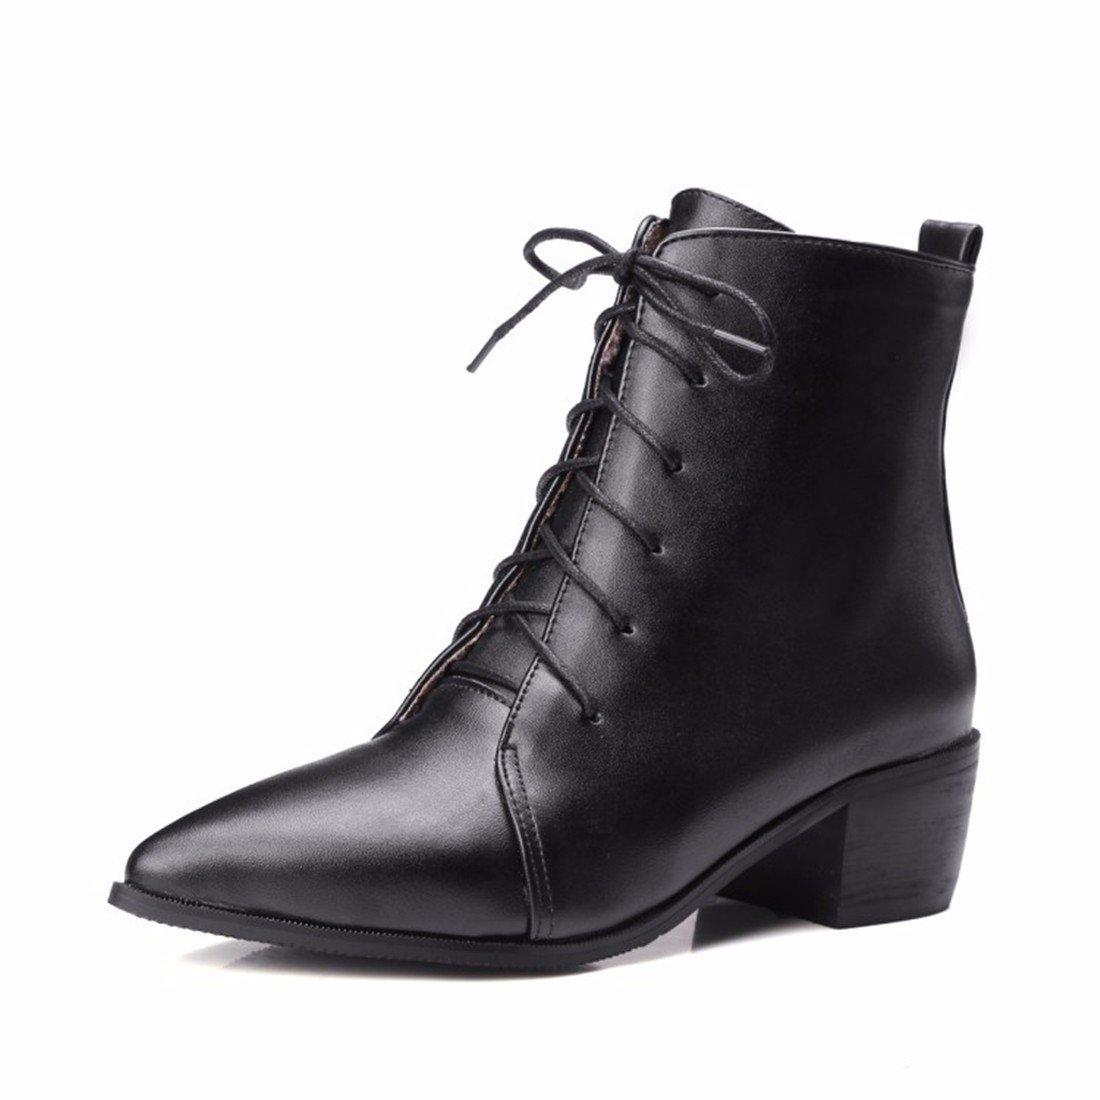 RFF-Damens's Schuhes Pointed Schuhes, Big Big Schuhes, Stiefel, Autumn Stiefel, and Martin Stiefel schwarz 063763